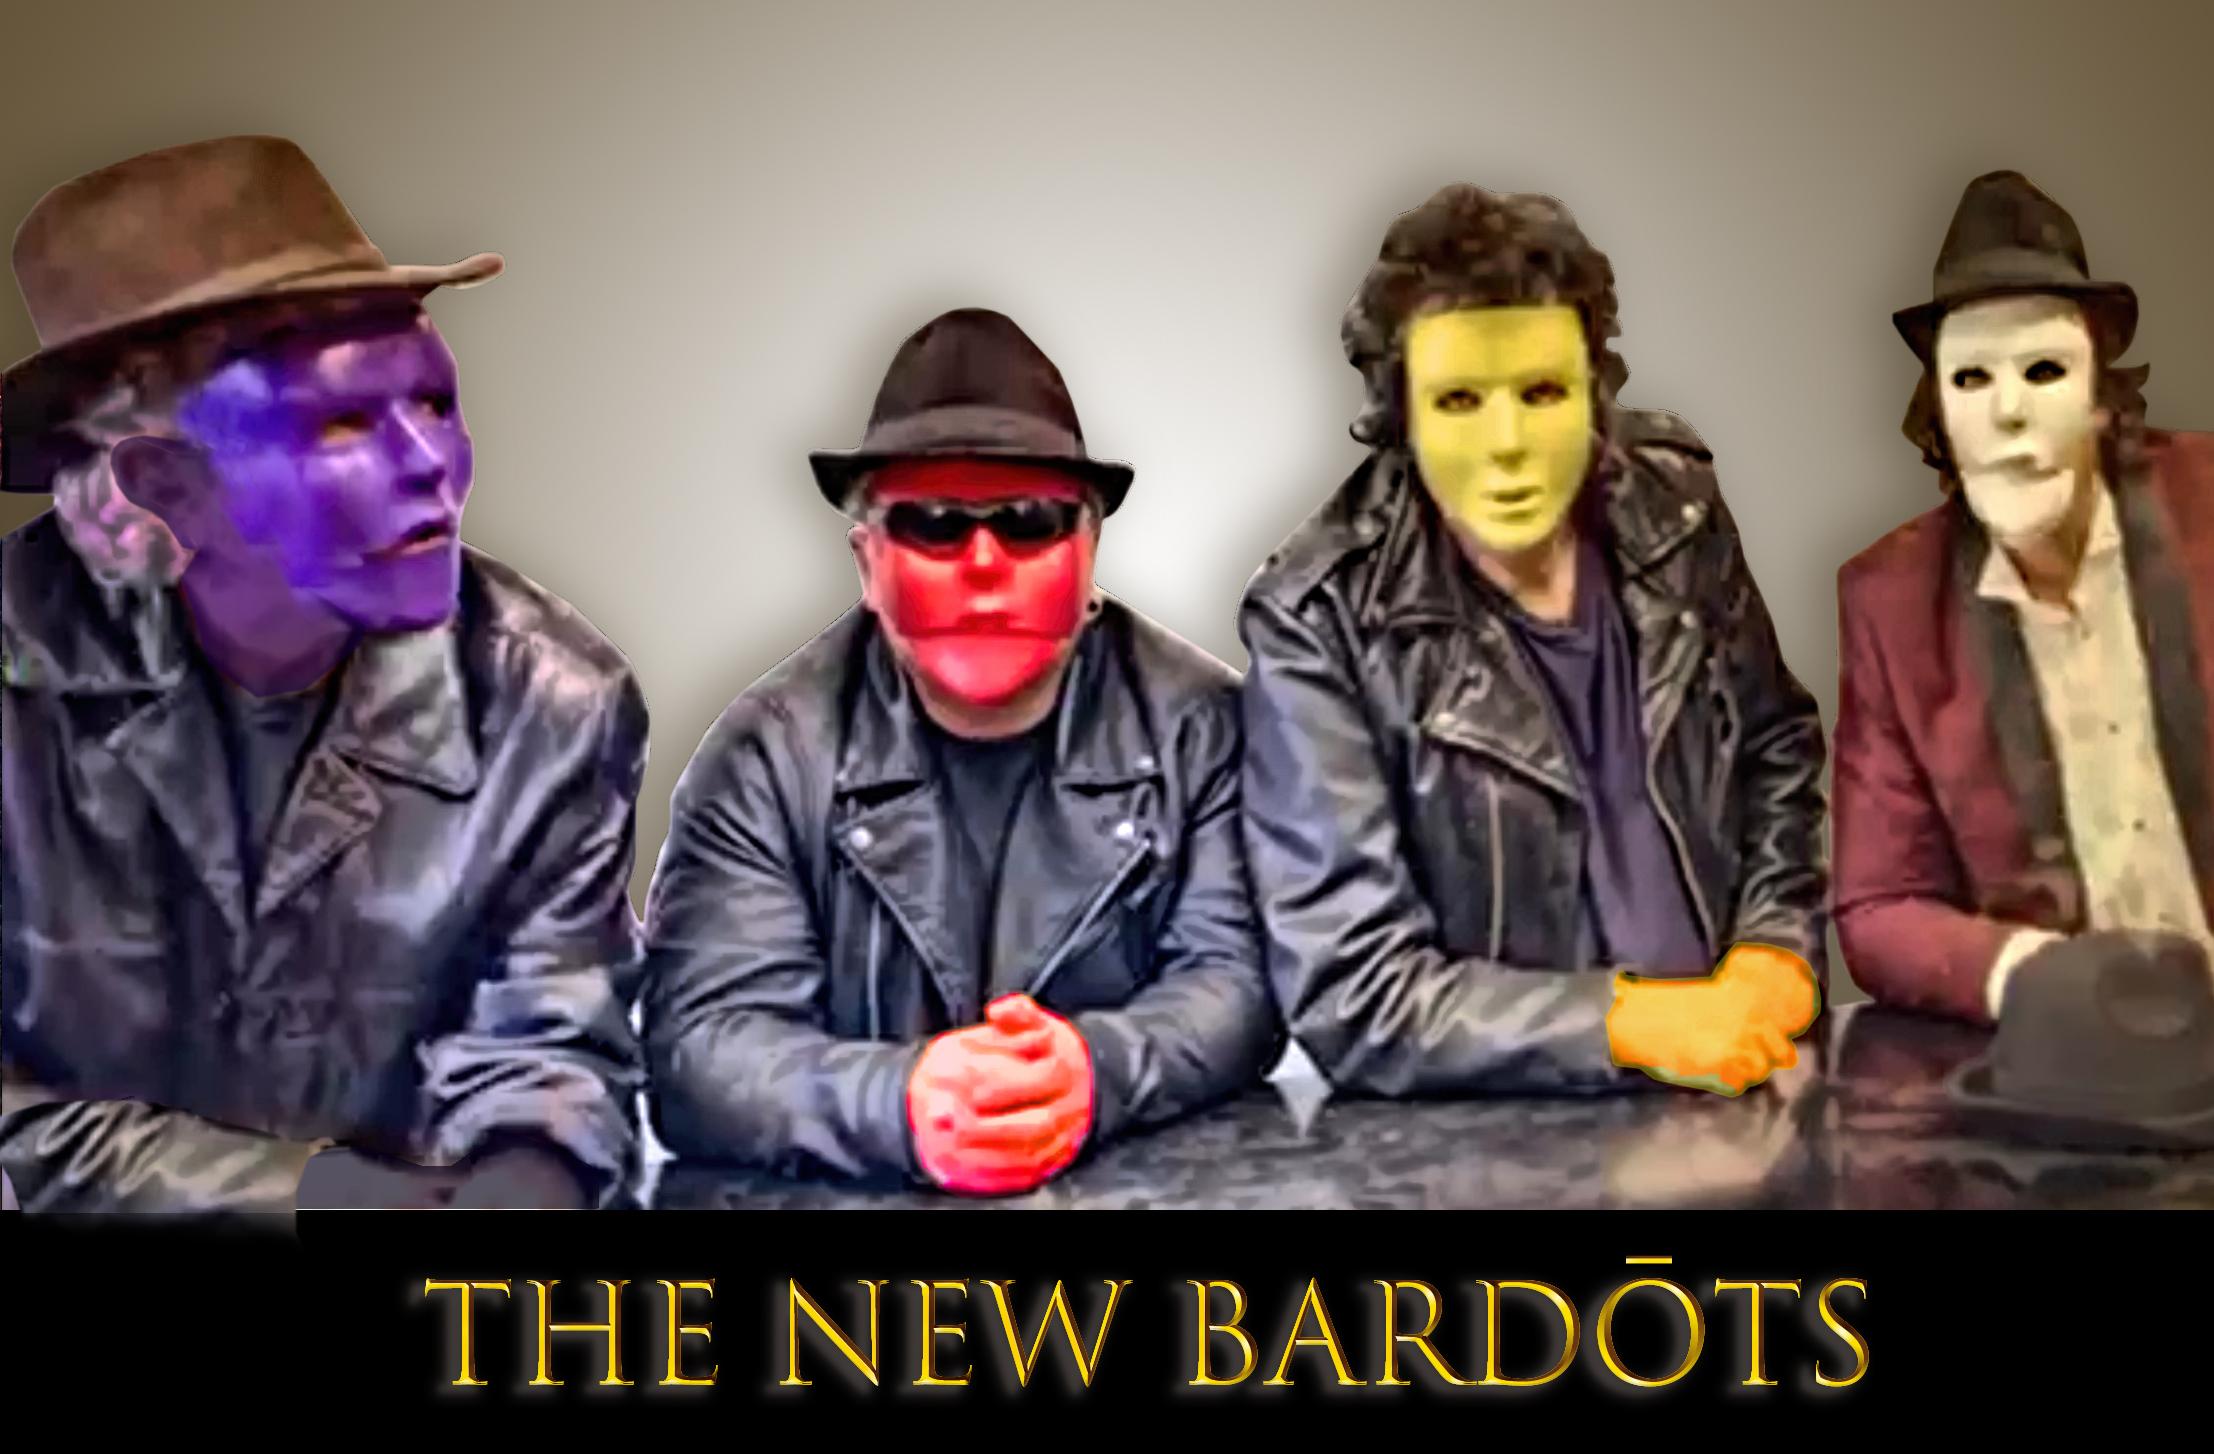 The-New-Bardots-ADD-PIC-TYPEJPEG-1.jpg